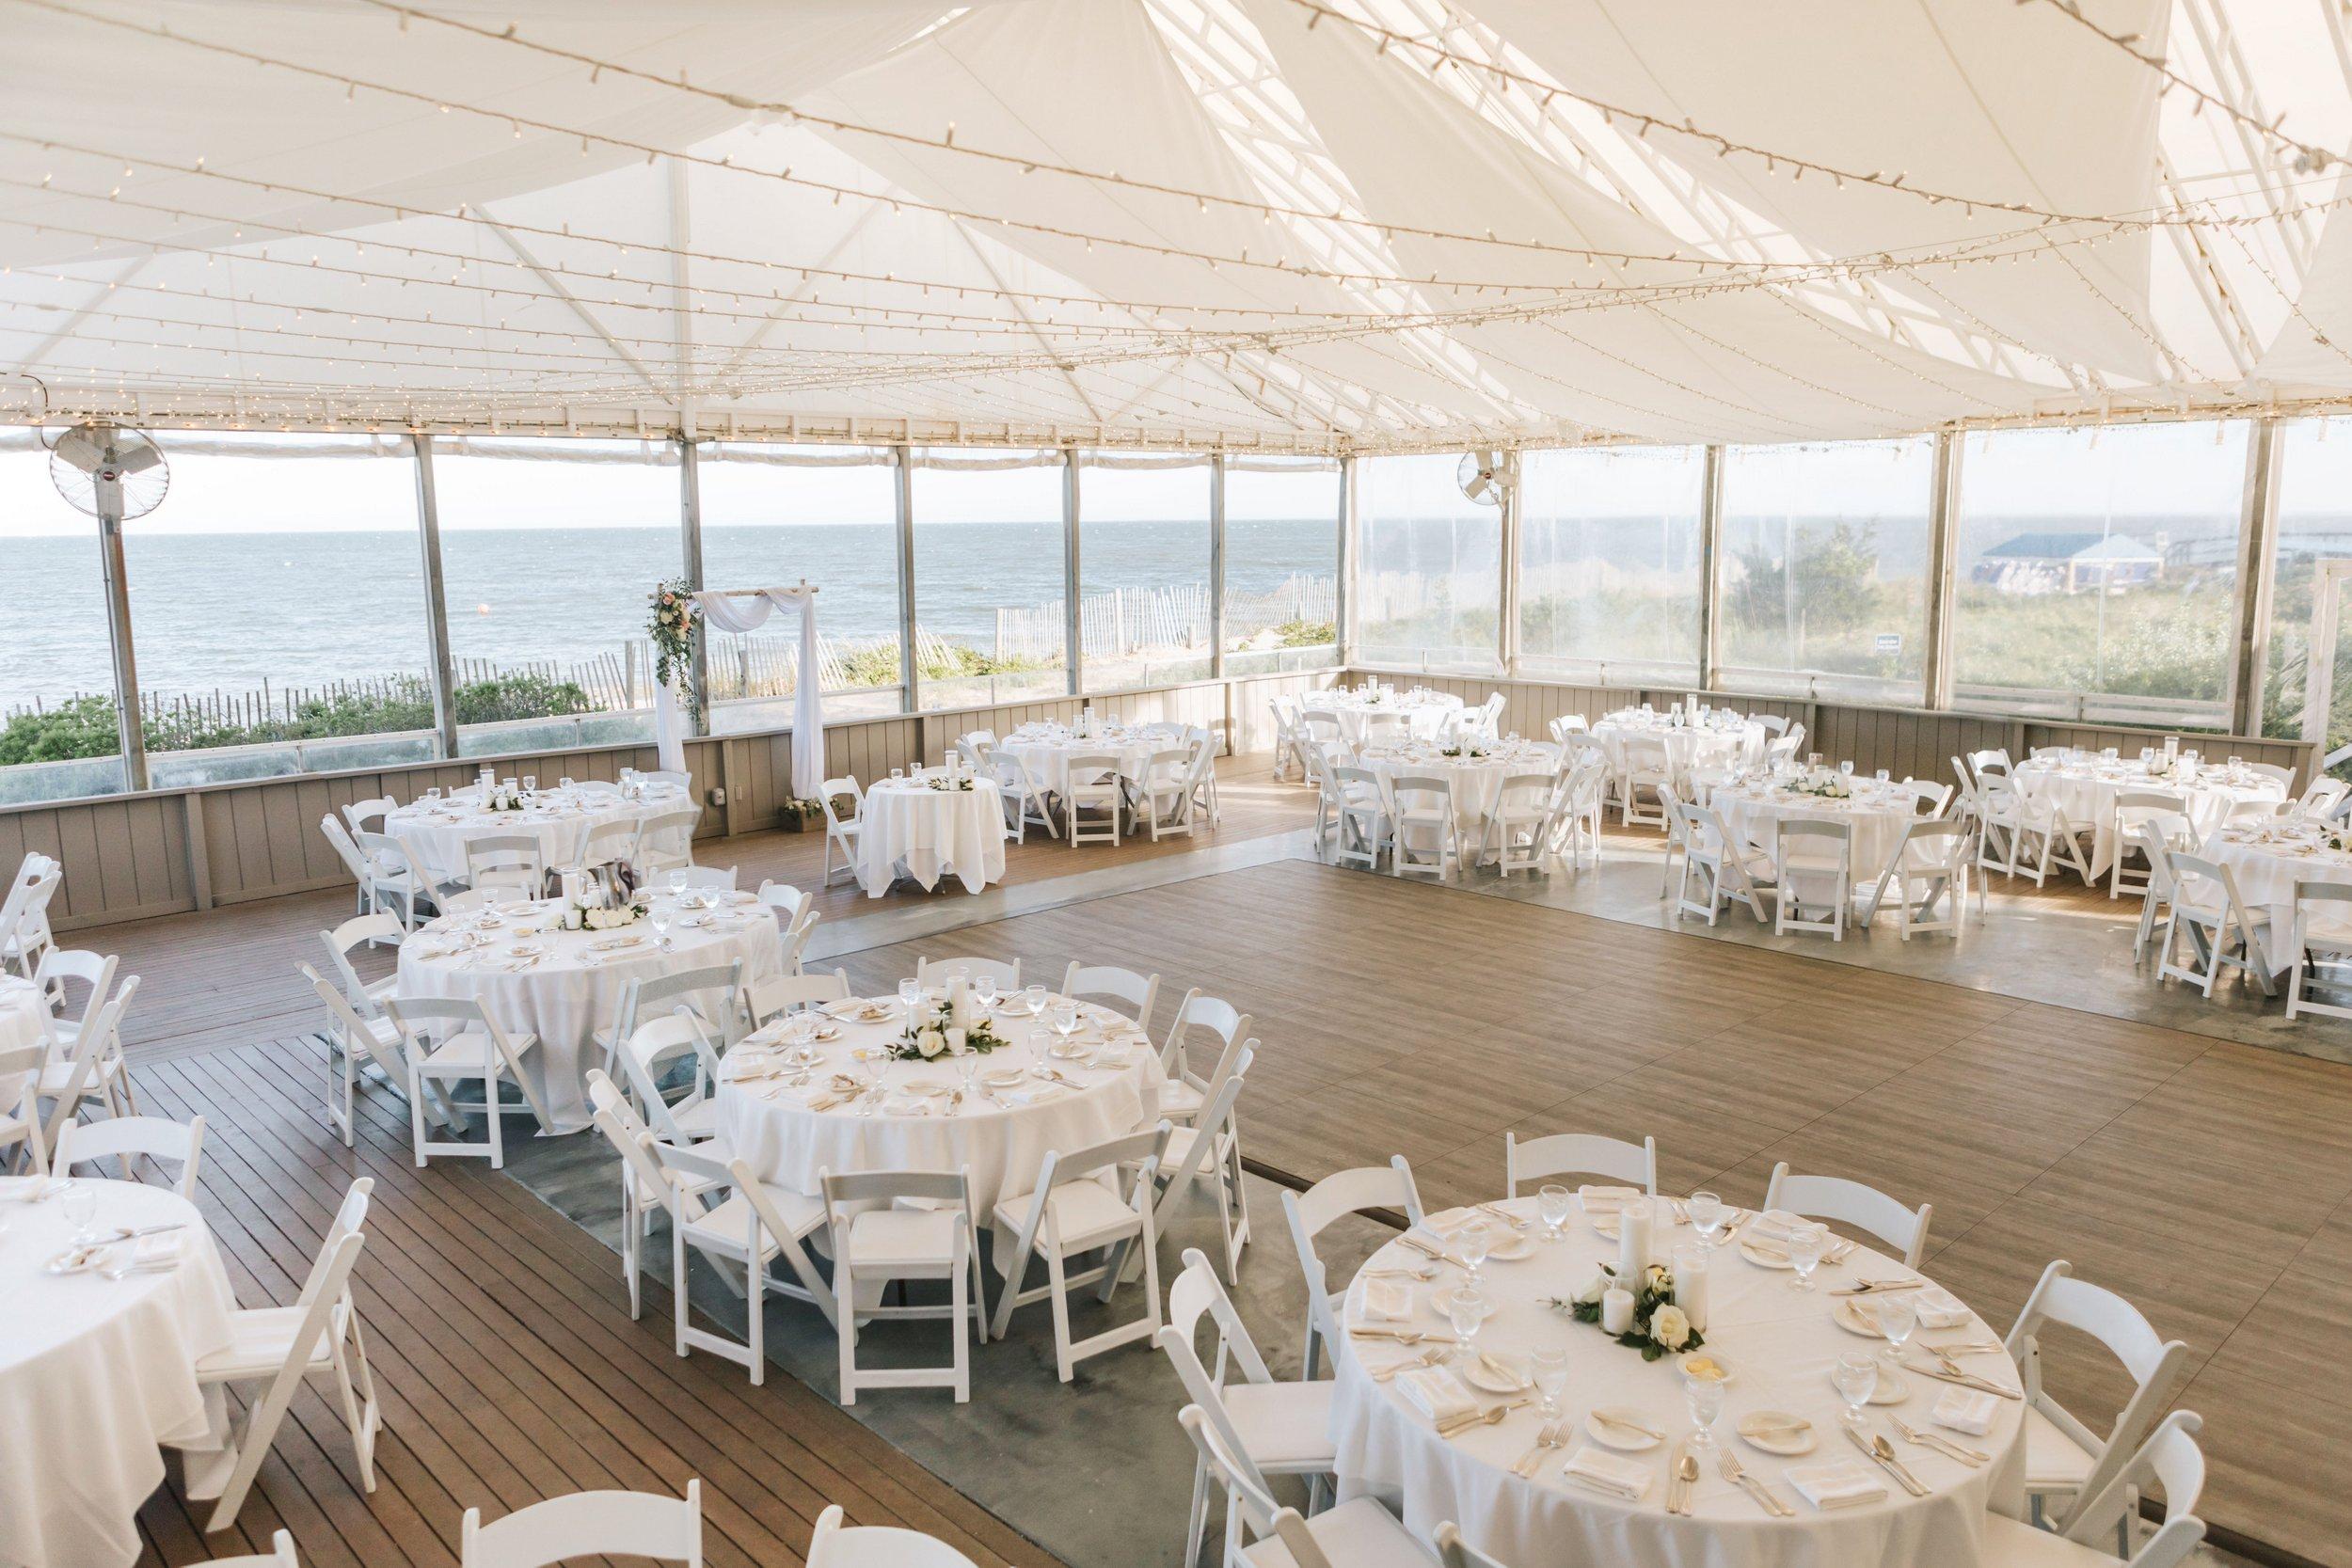 Popponesset-Inn-Wedding-Cape-Cod-Lena-Mirisola-Photography-37B.jpg